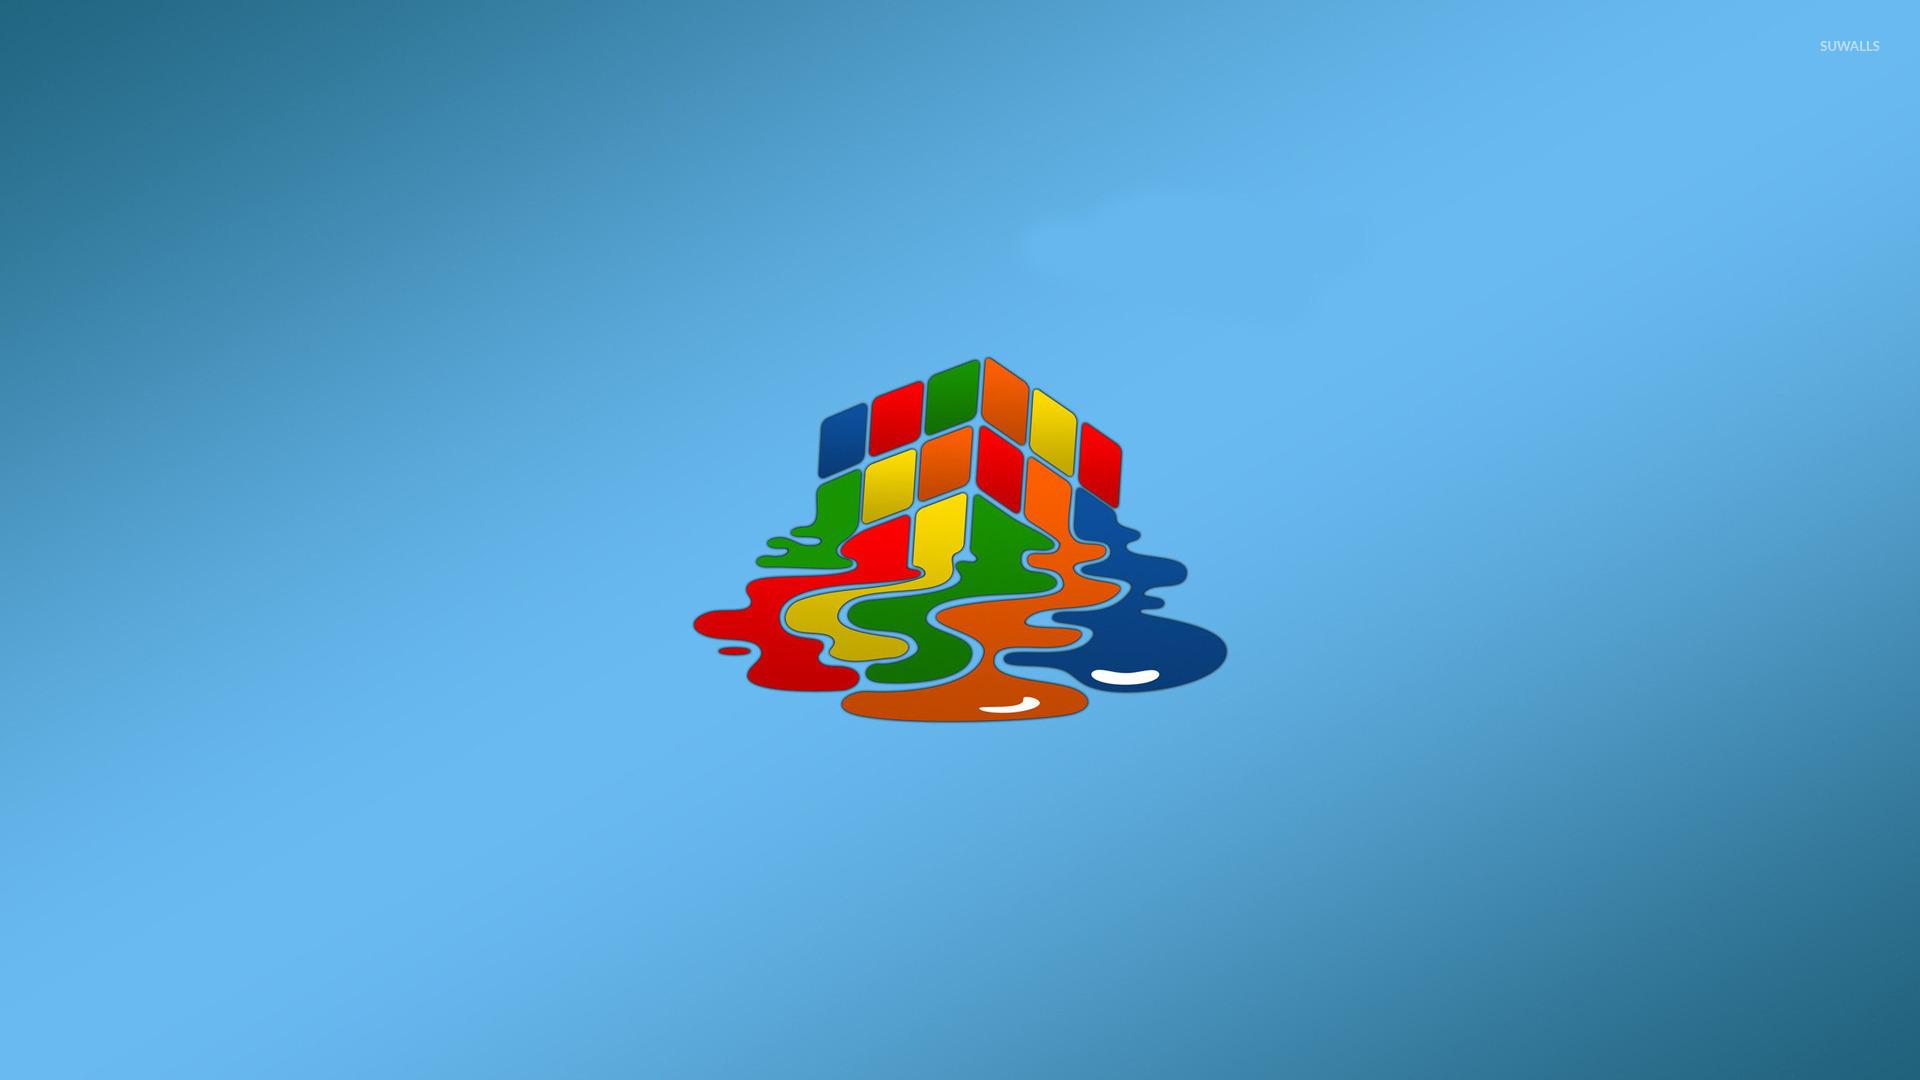 Melting Rubiks cube wallpaper   Minimalistic wallpapers   18070 1920x1080